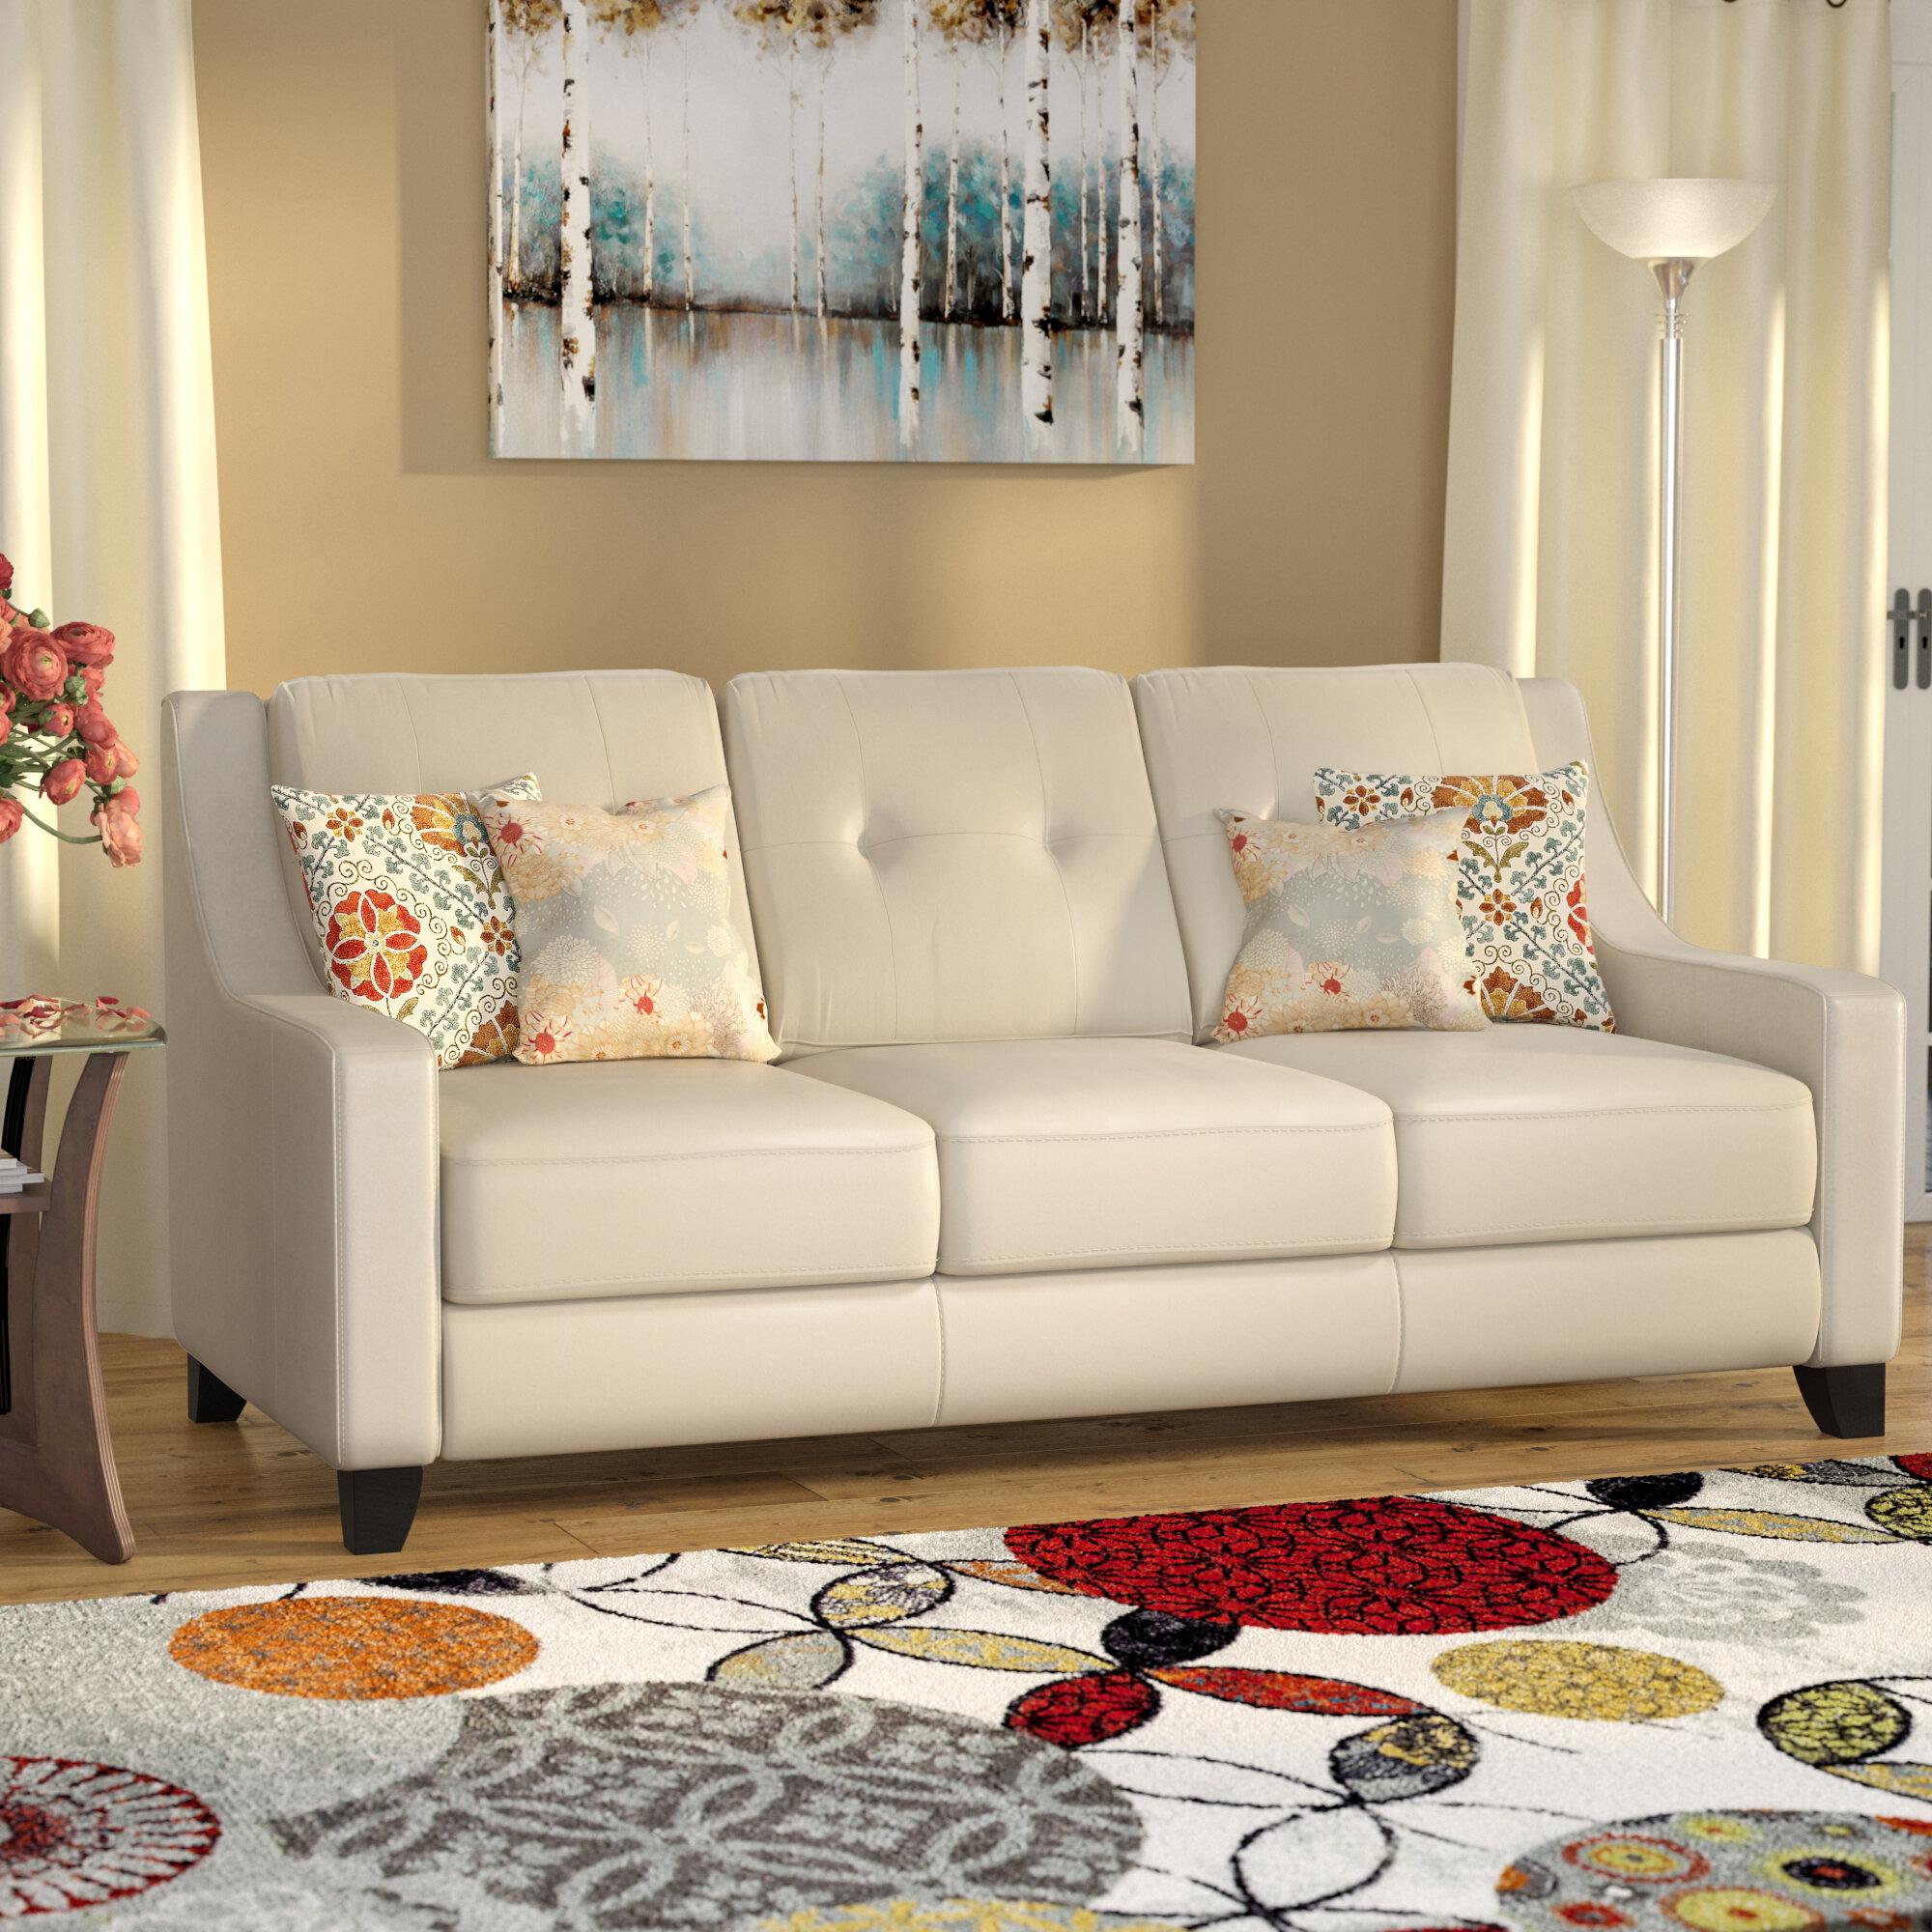 Red Barrel Studio Stouffer Sofa & Reviews | Wayfair